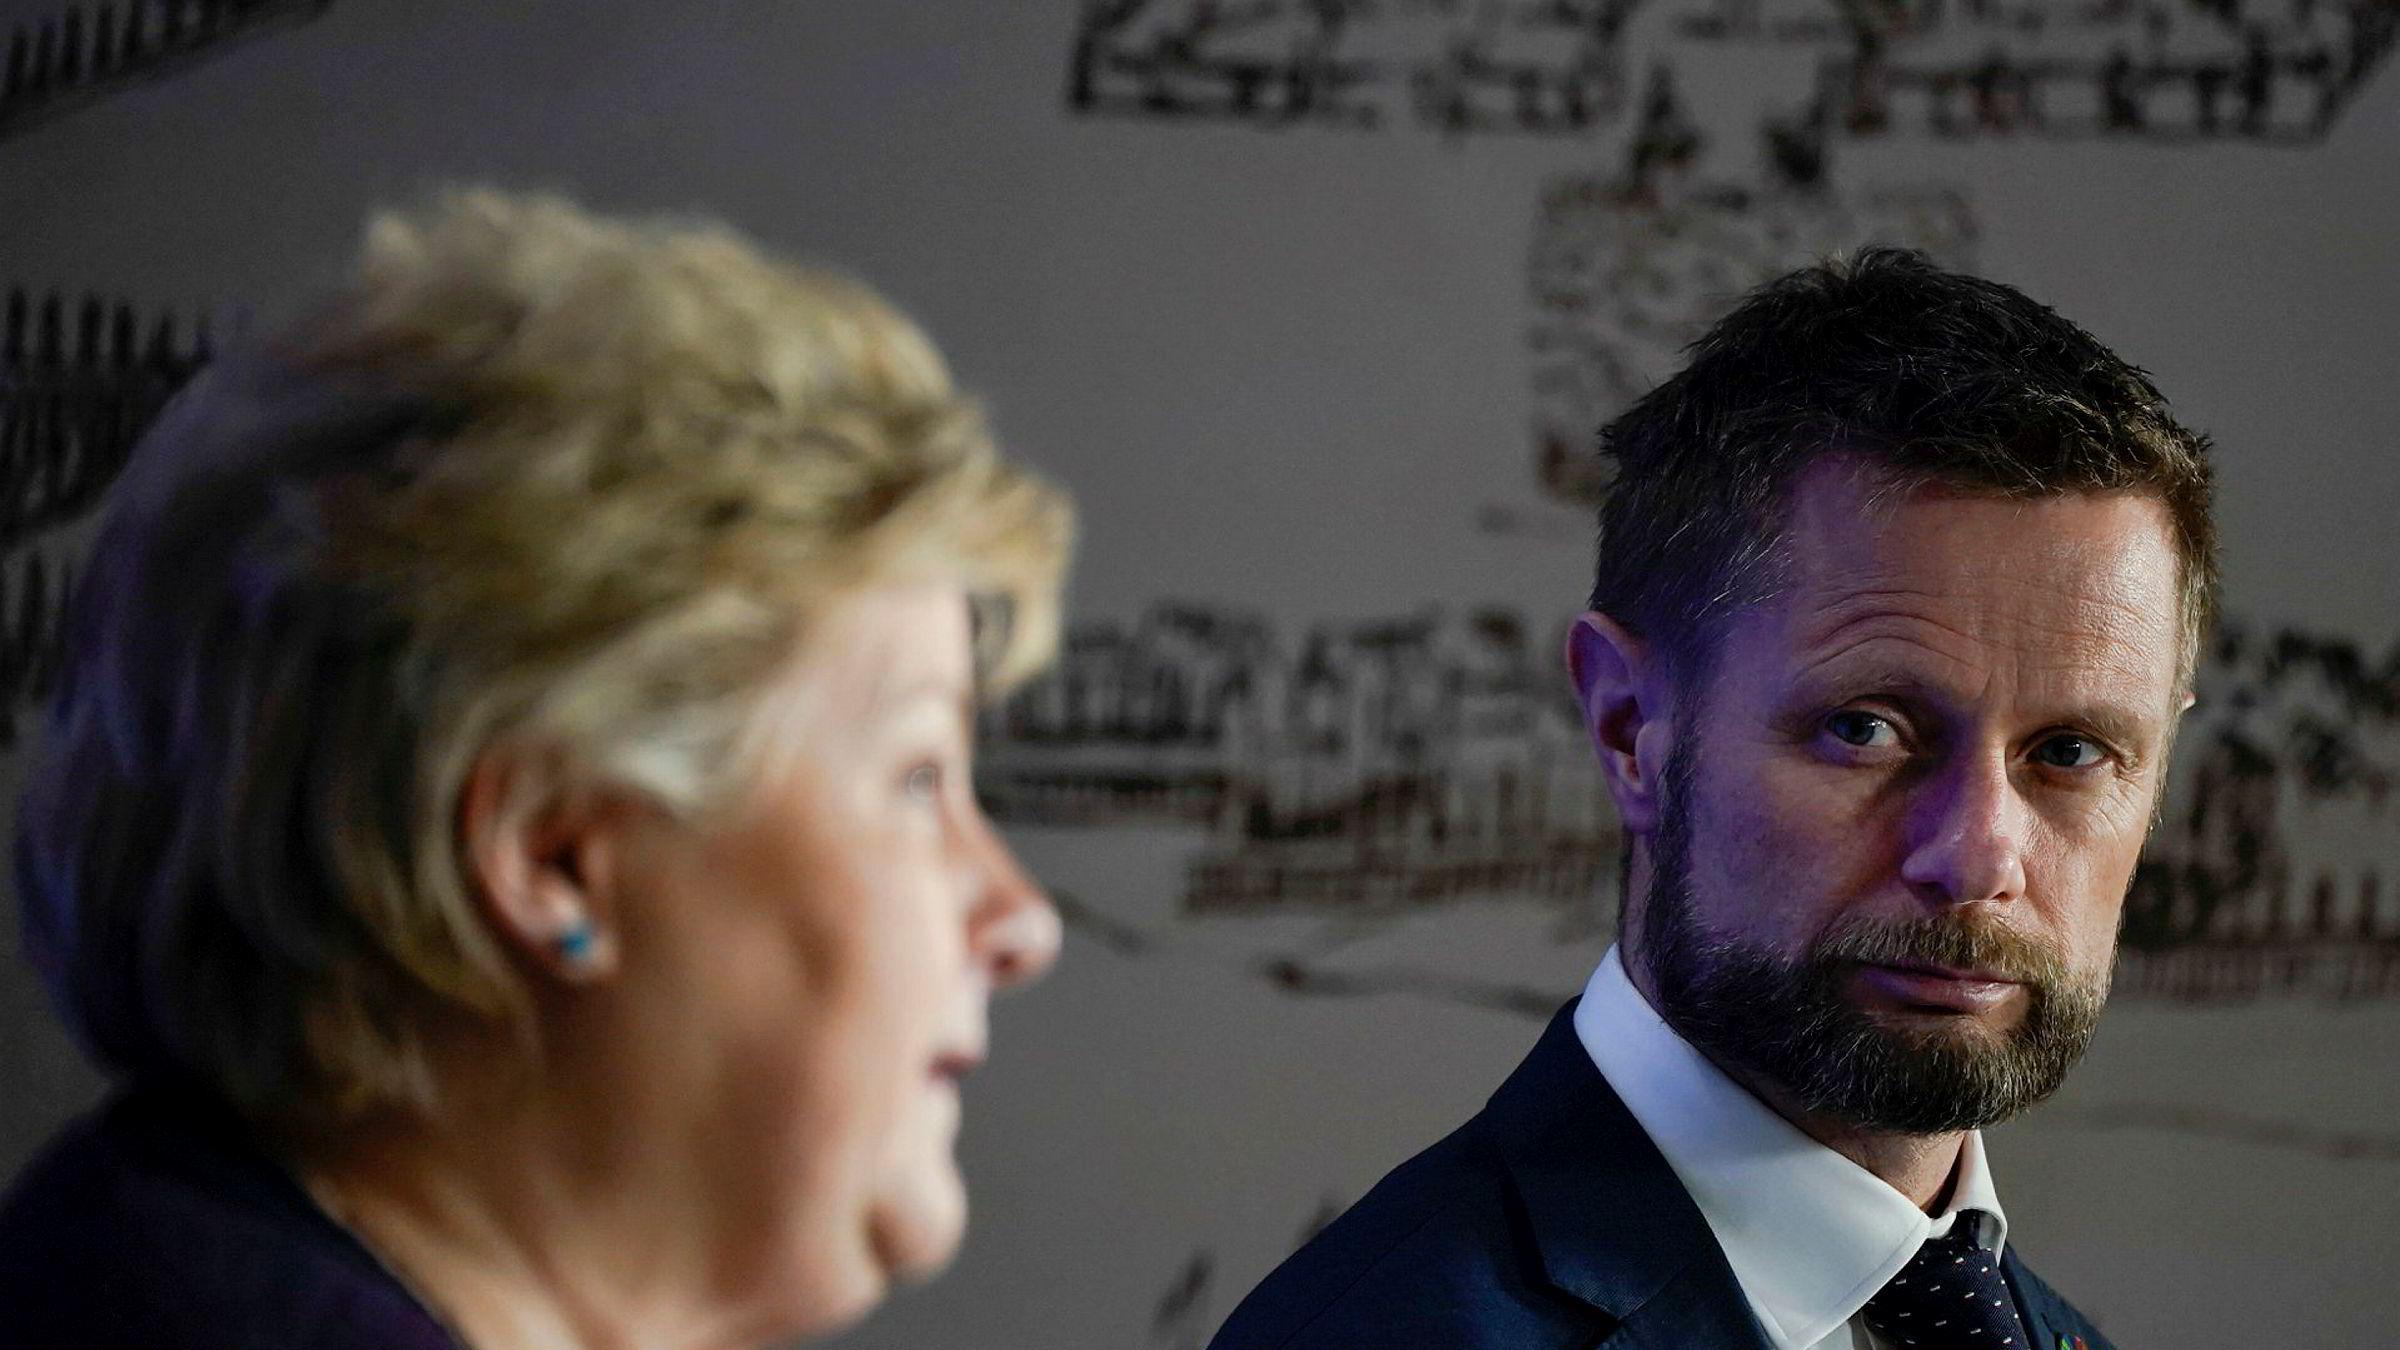 Statsminister Erna Solberg og helse- og omsorgsminister Bent Høie på pressekonferansen tirsdag.